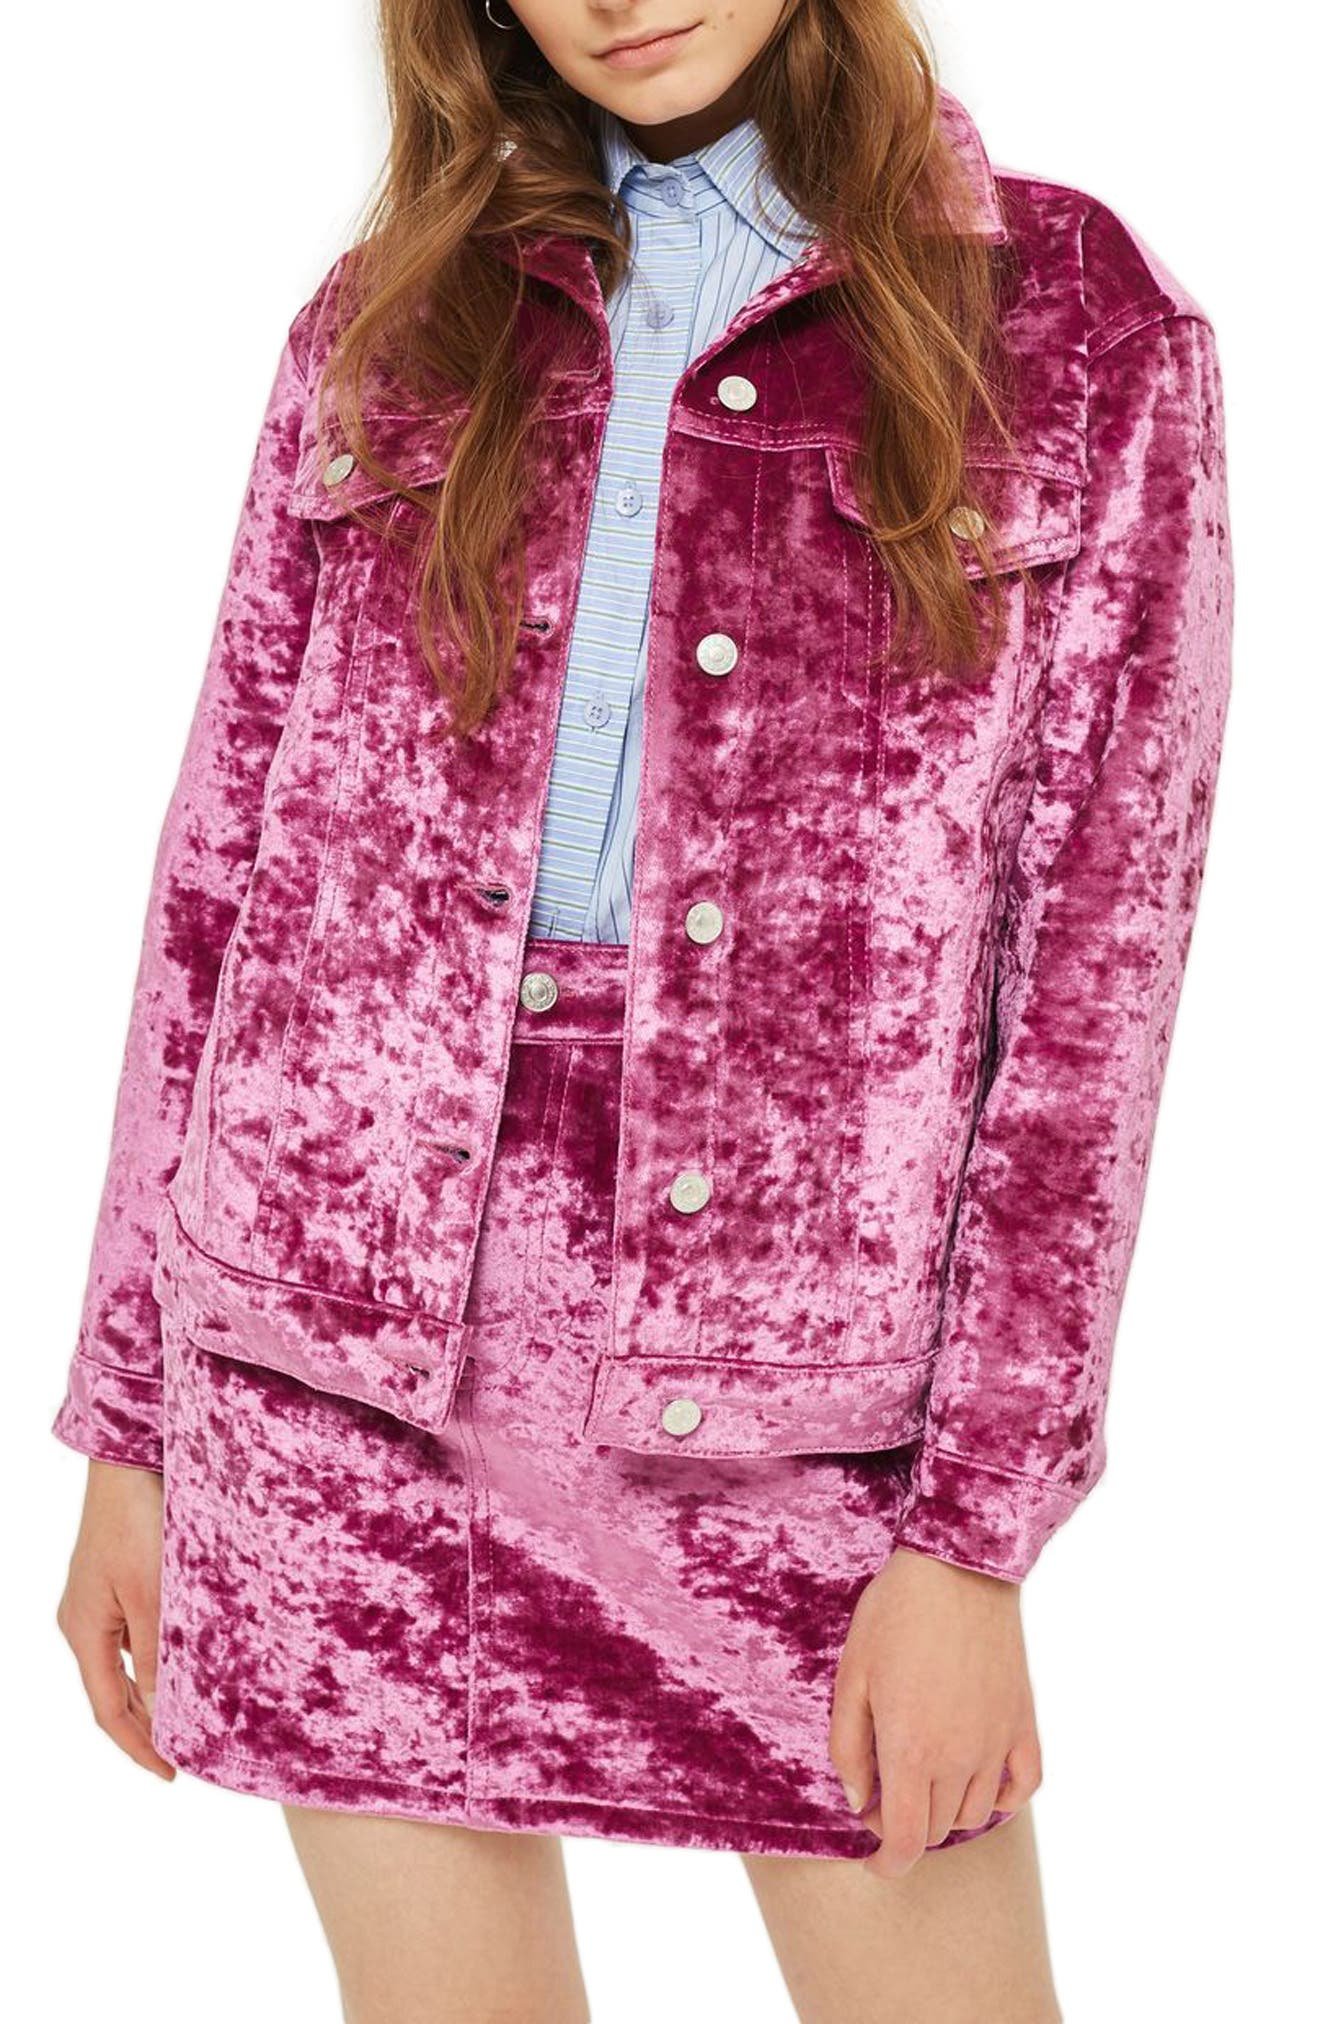 Alternate Image 1 Selected - Topshop Bonded Velvet Jacket